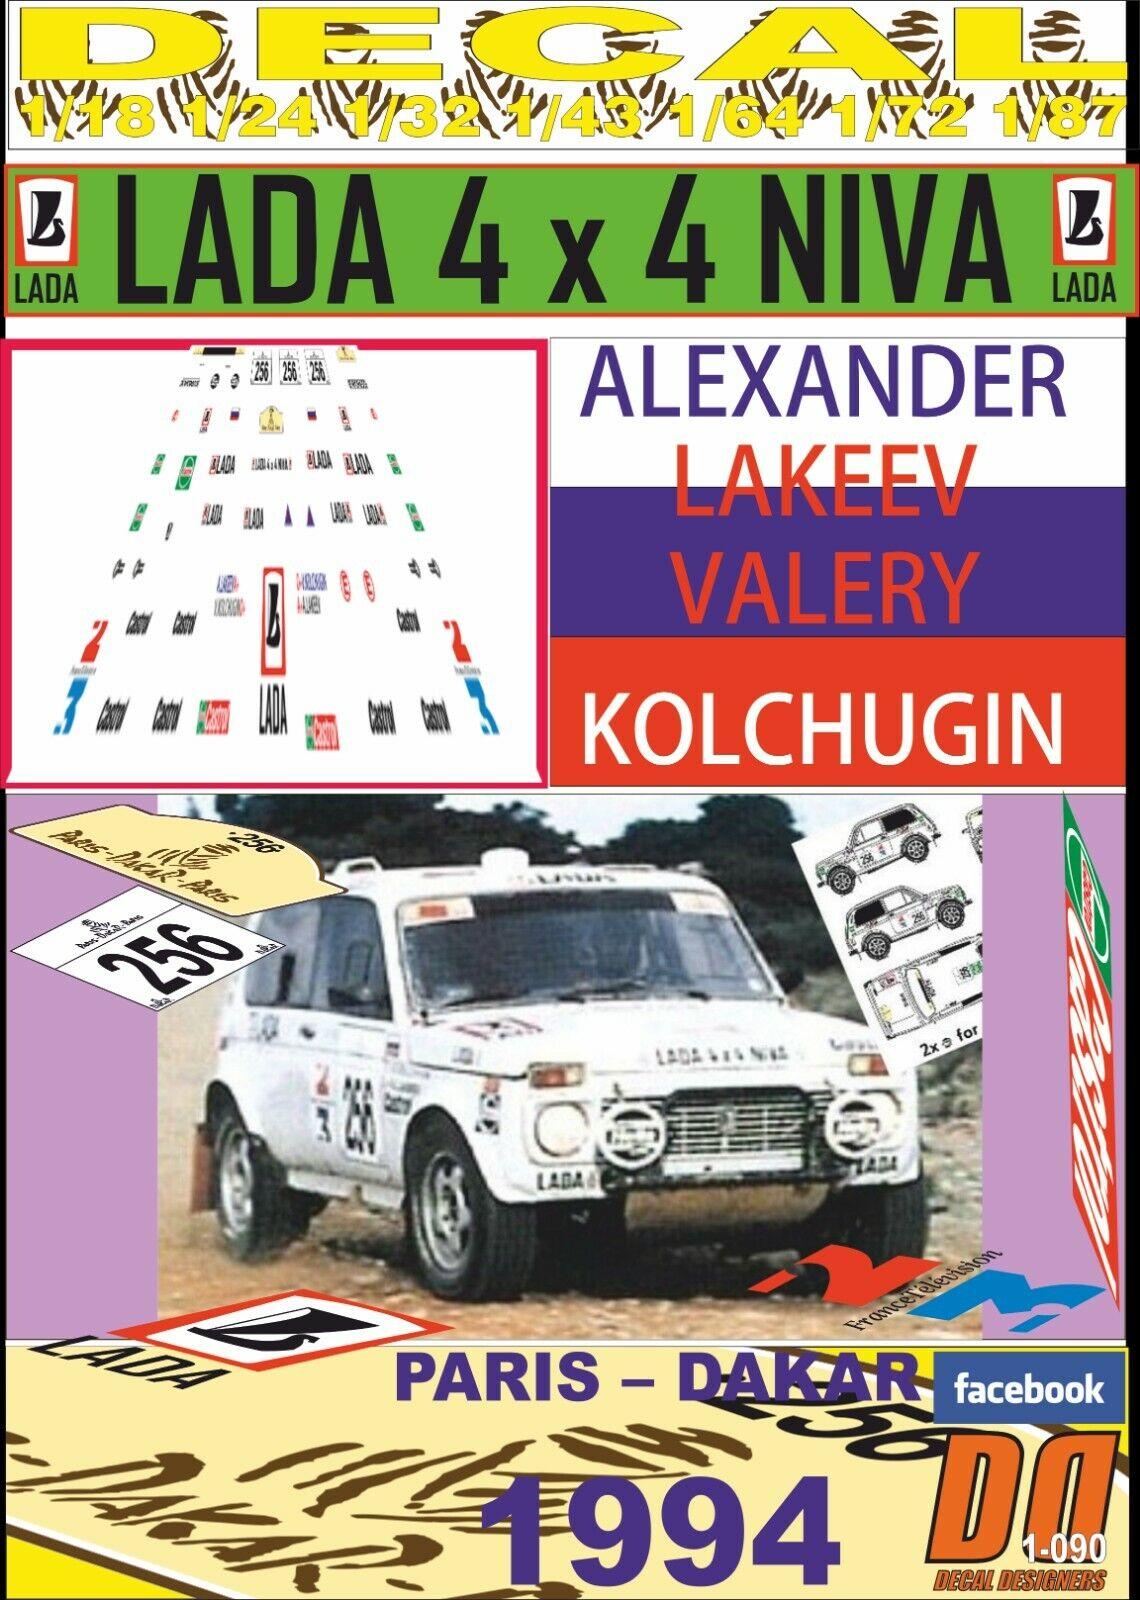 DECAL LADA NIVA {65533;C VAZ 2121 ALEXANDR LAKKEV PARIS DAKAR 1994 (03)